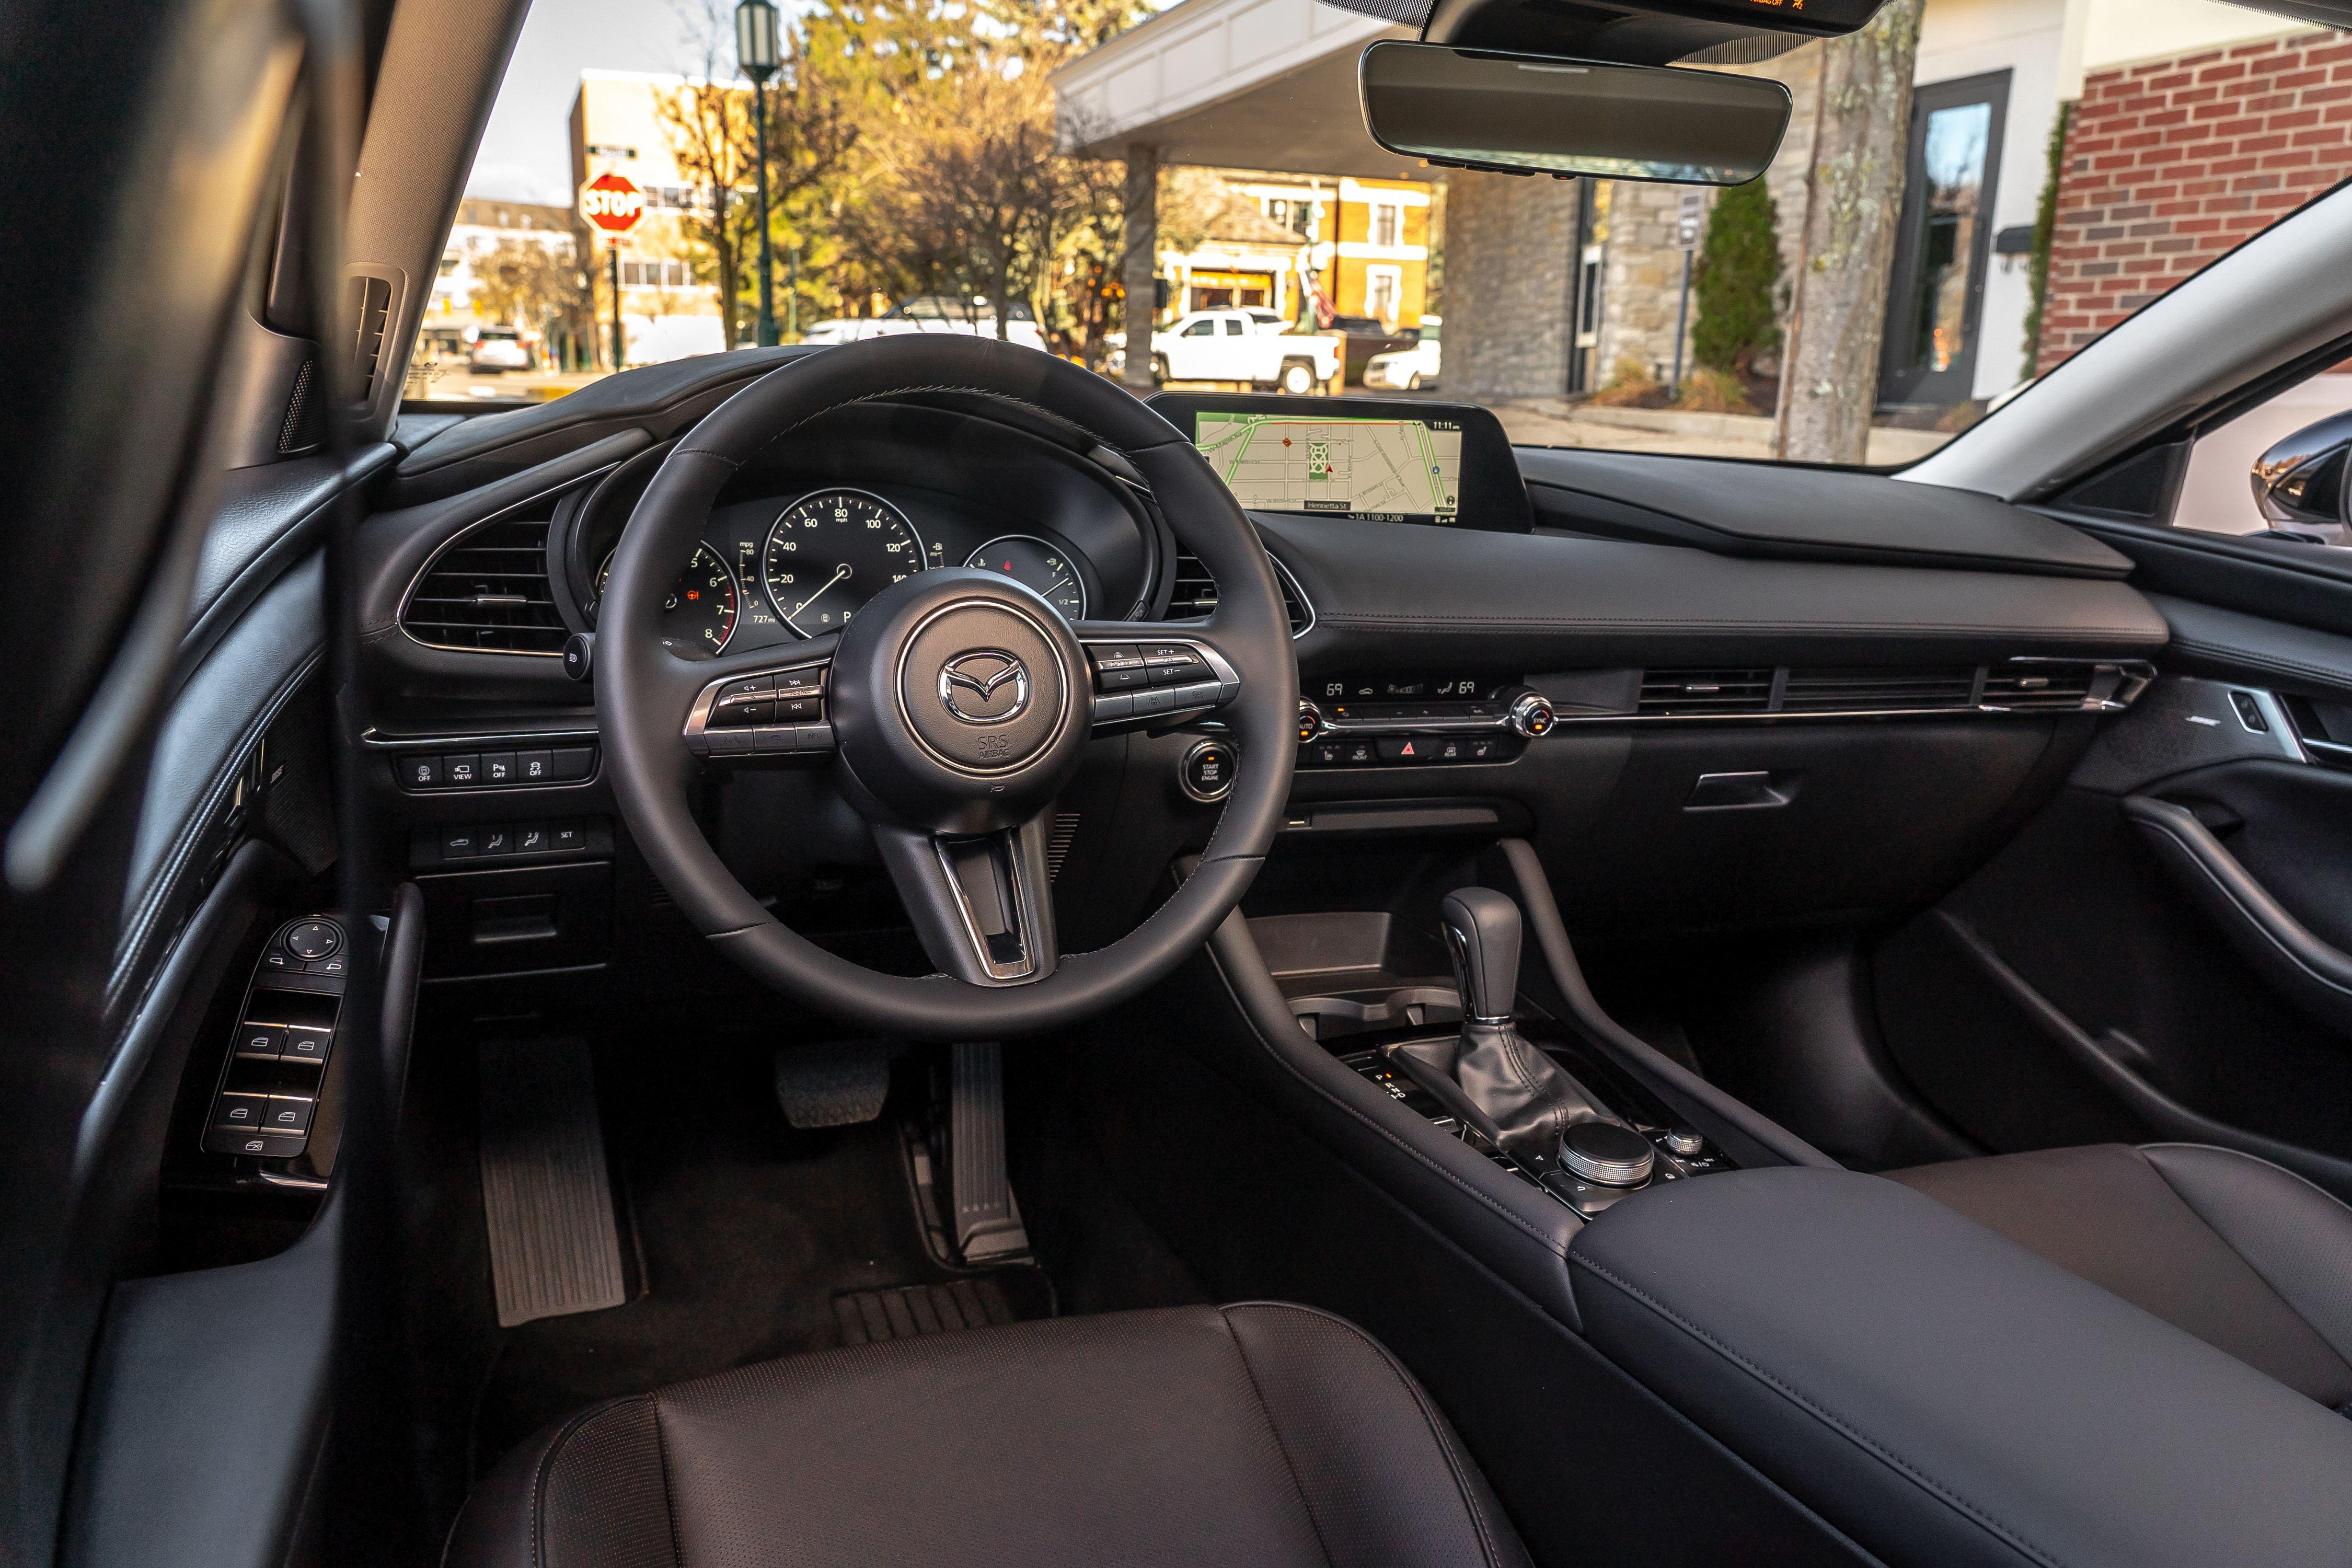 https://hips.hearstapps.com/hmg-prod.s3.amazonaws.com/images/2021-mazda-3-turbo-awd-sedan-108-1605850981.jpg